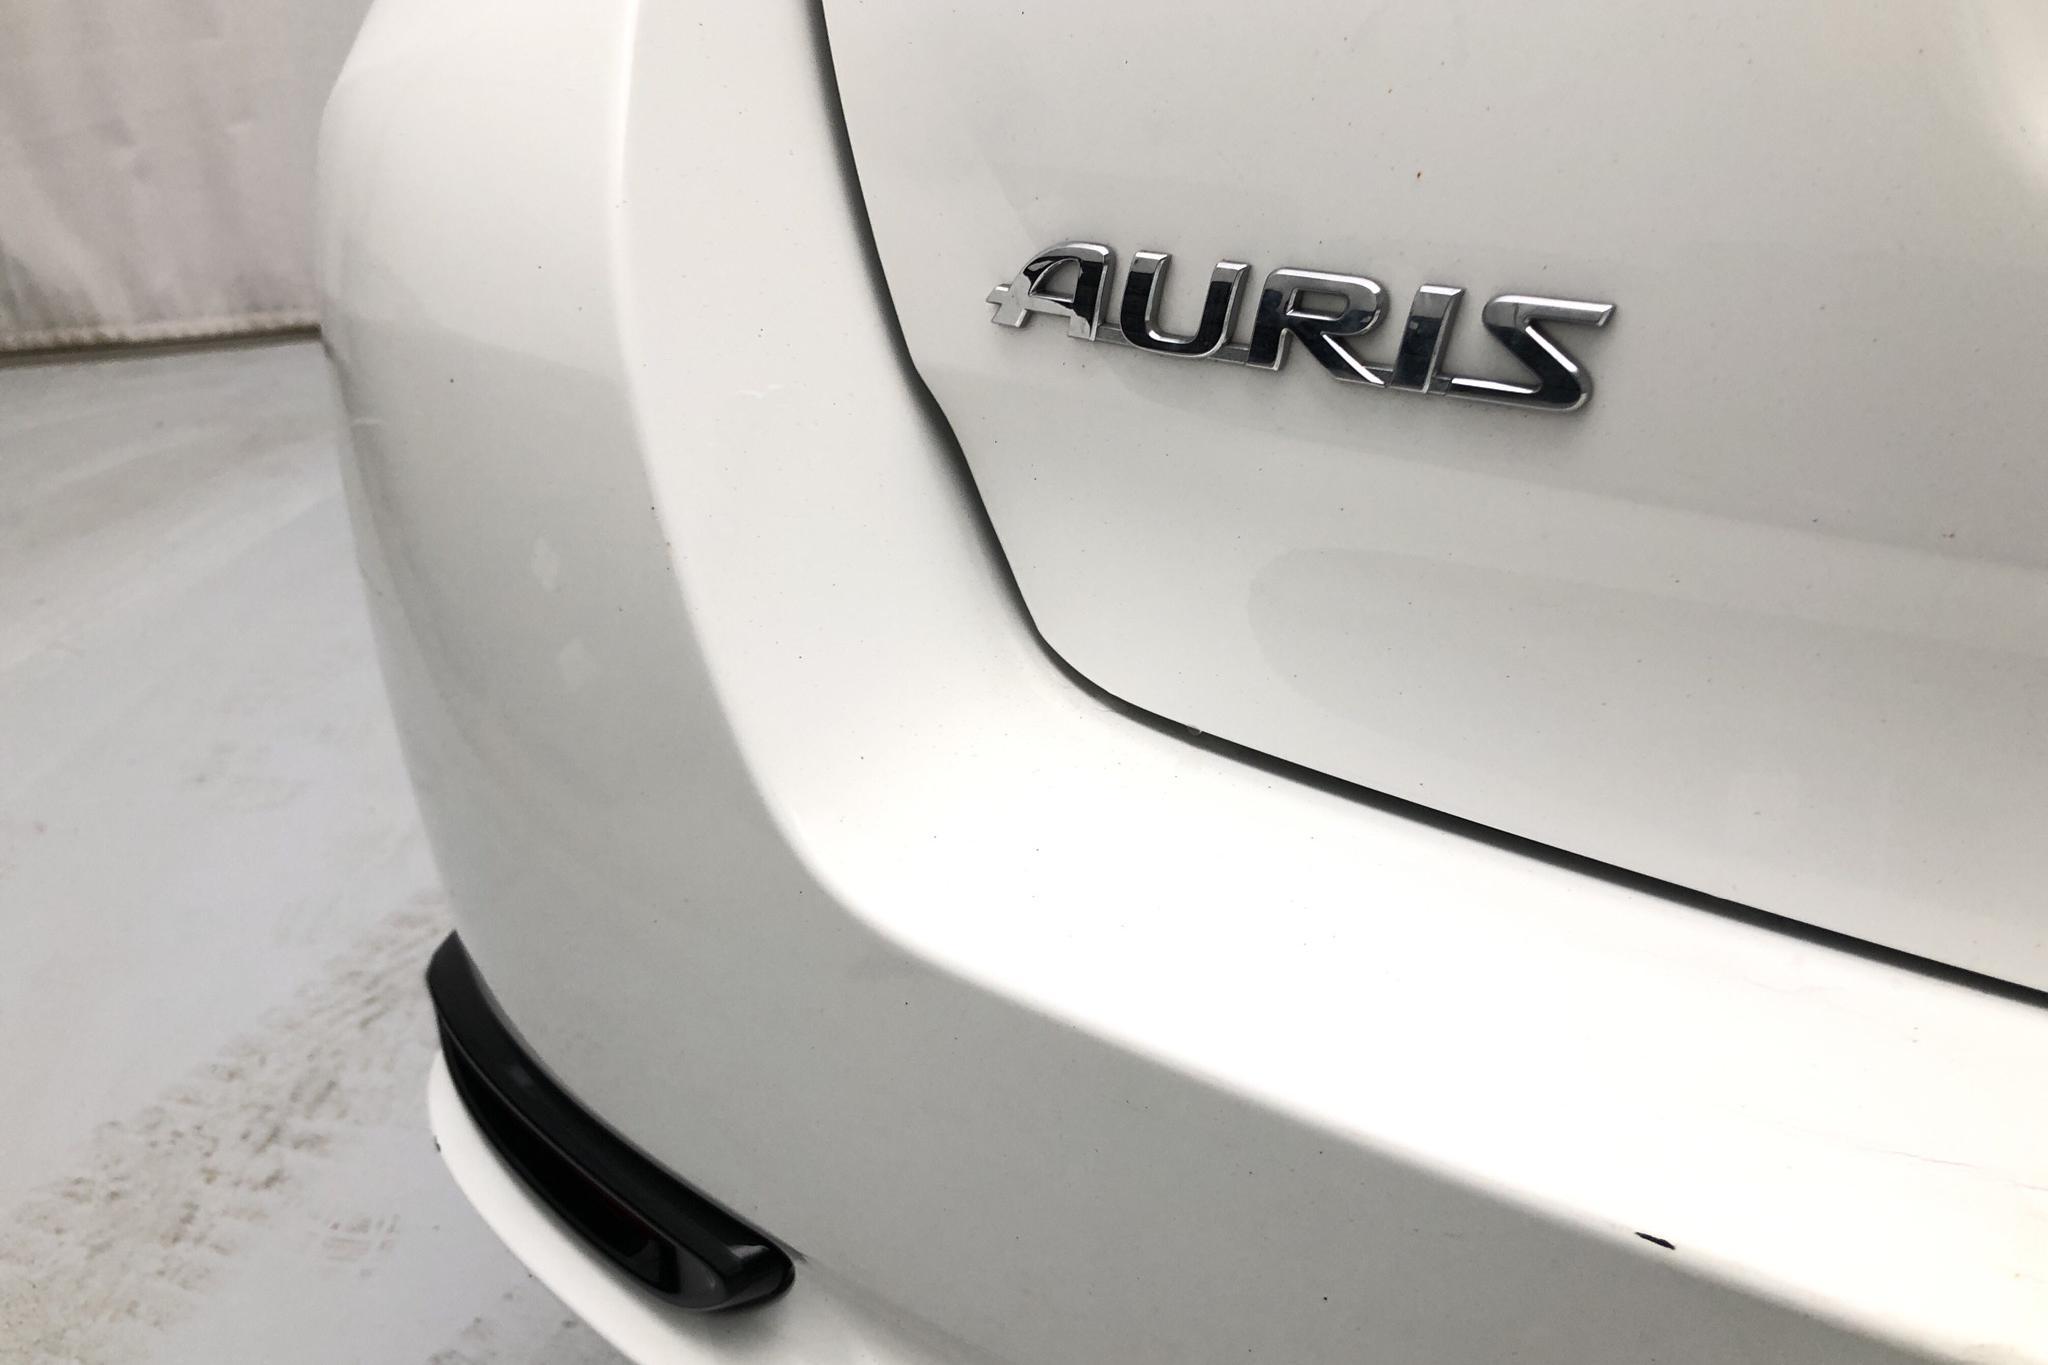 Toyota Auris 1.8 HSD Touring Sports (99hk) - 115 630 km - Automatic - white - 2017